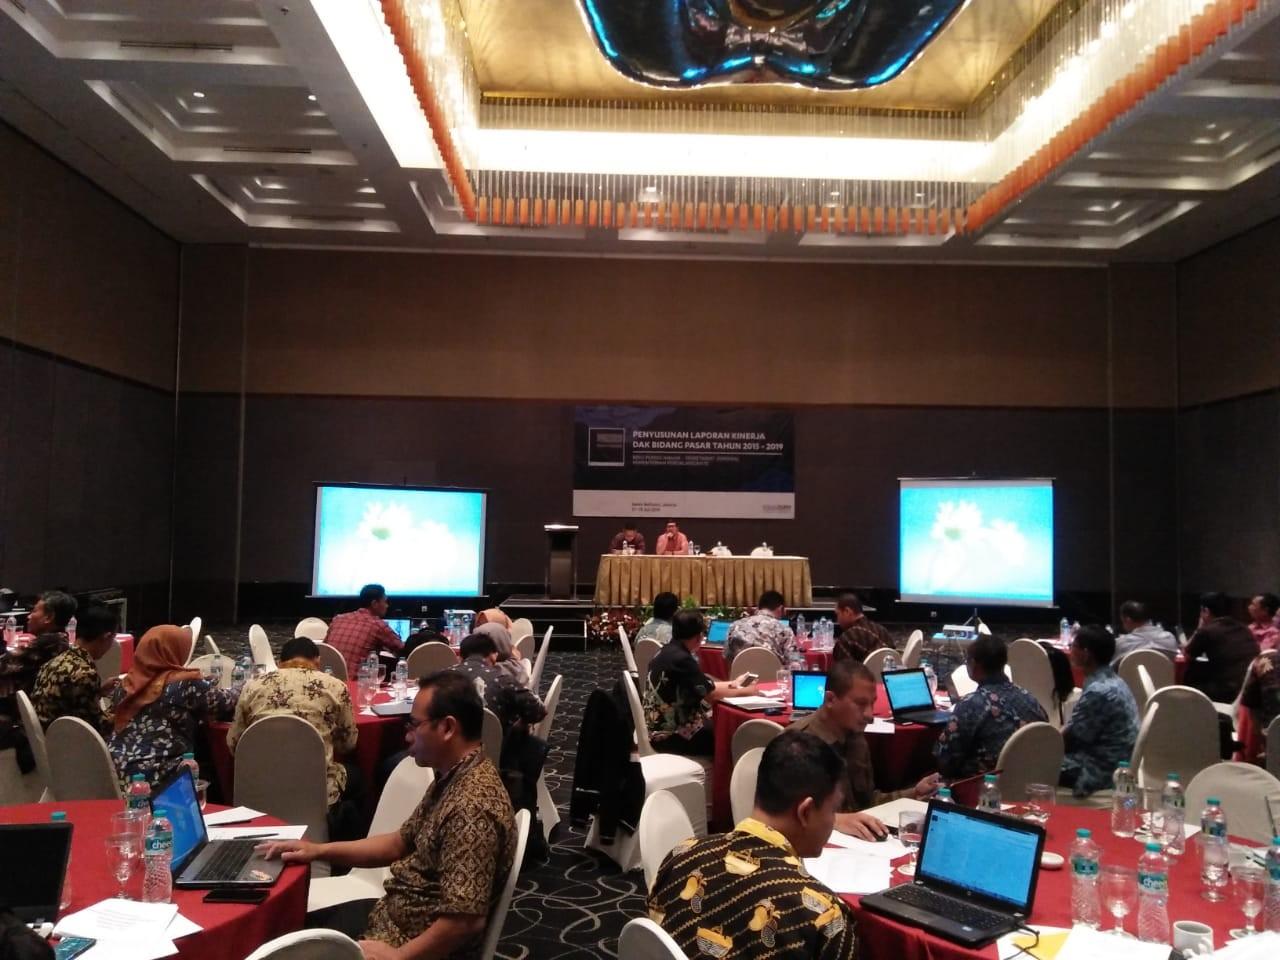 Penyusunan Laporan dan Penyempurnaan Data DAK Bidang Pasar Tahun 2015-2019